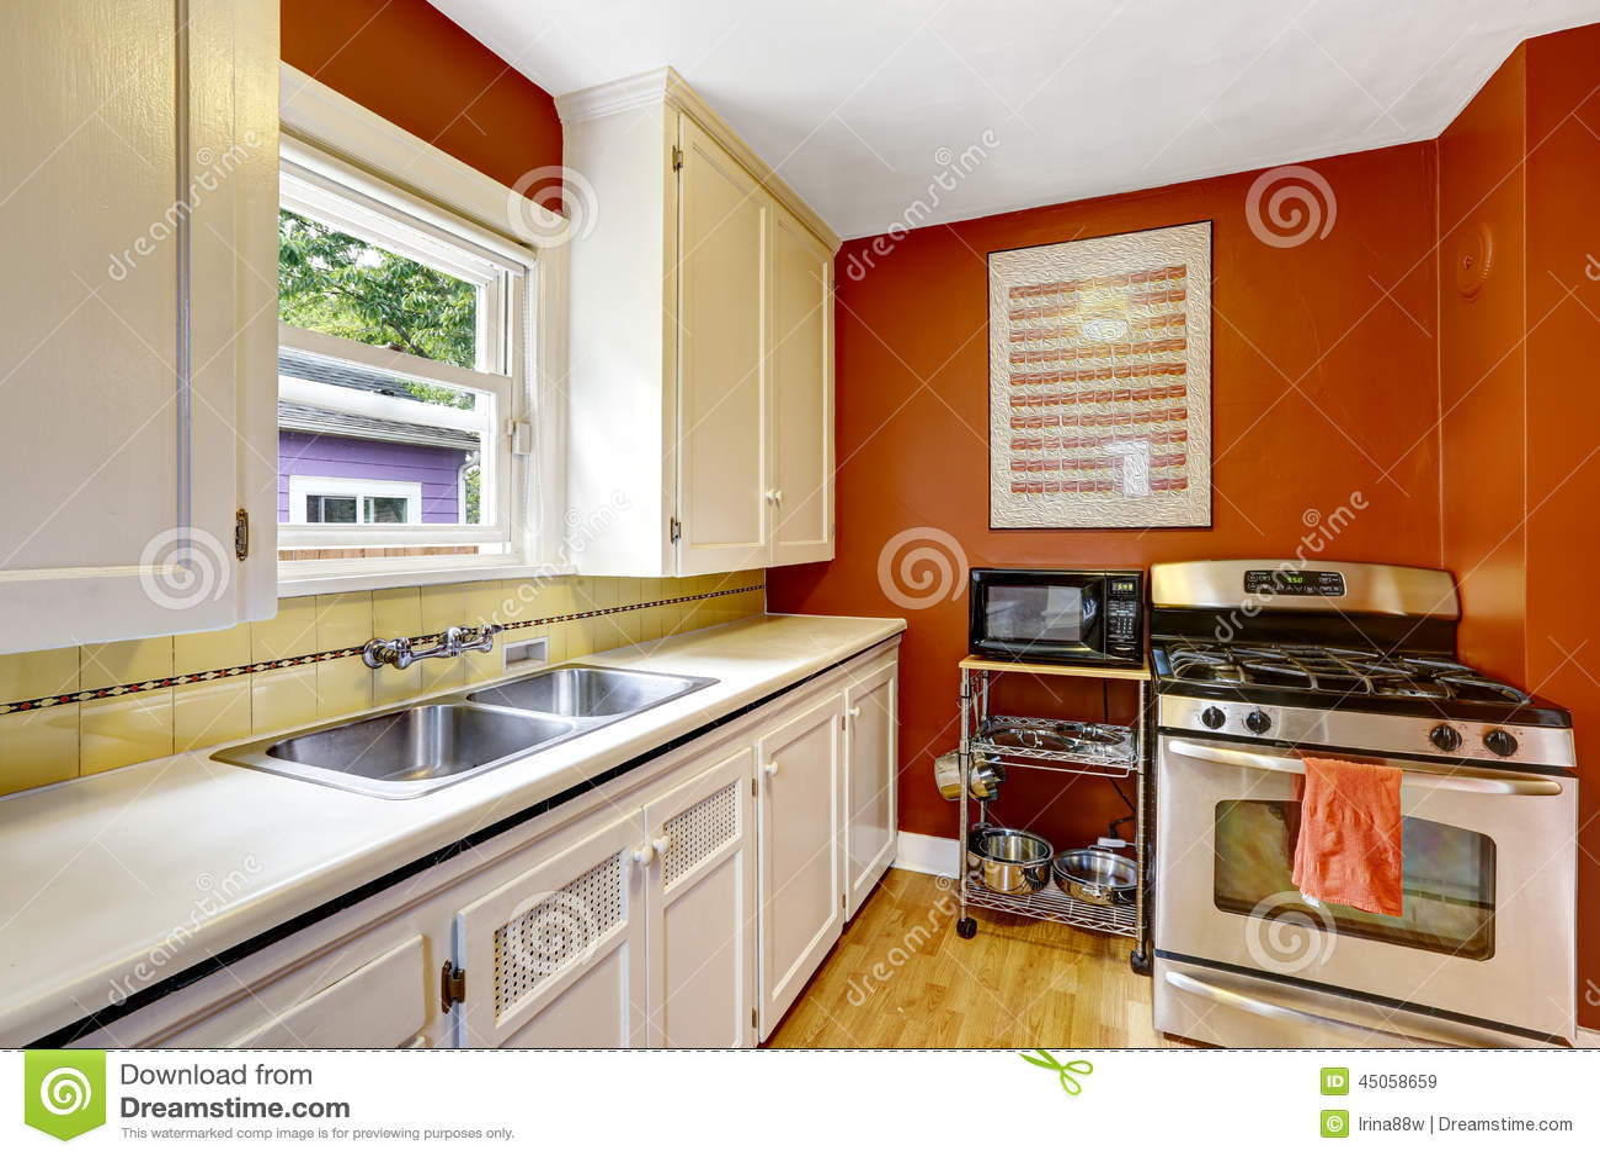 Standaard Witte Keukenkasten: Witte keuken houten werkblad blok ...